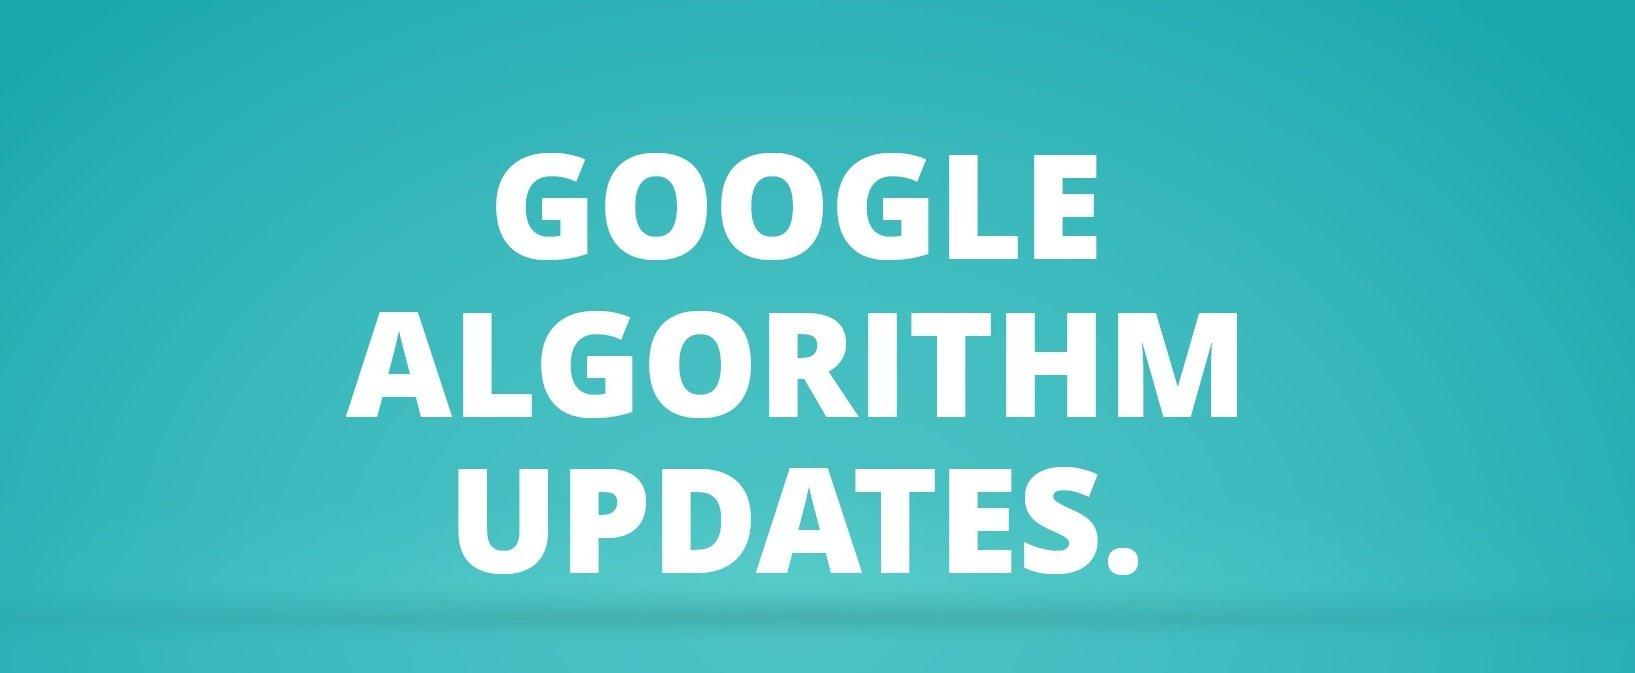 updates-google-seo